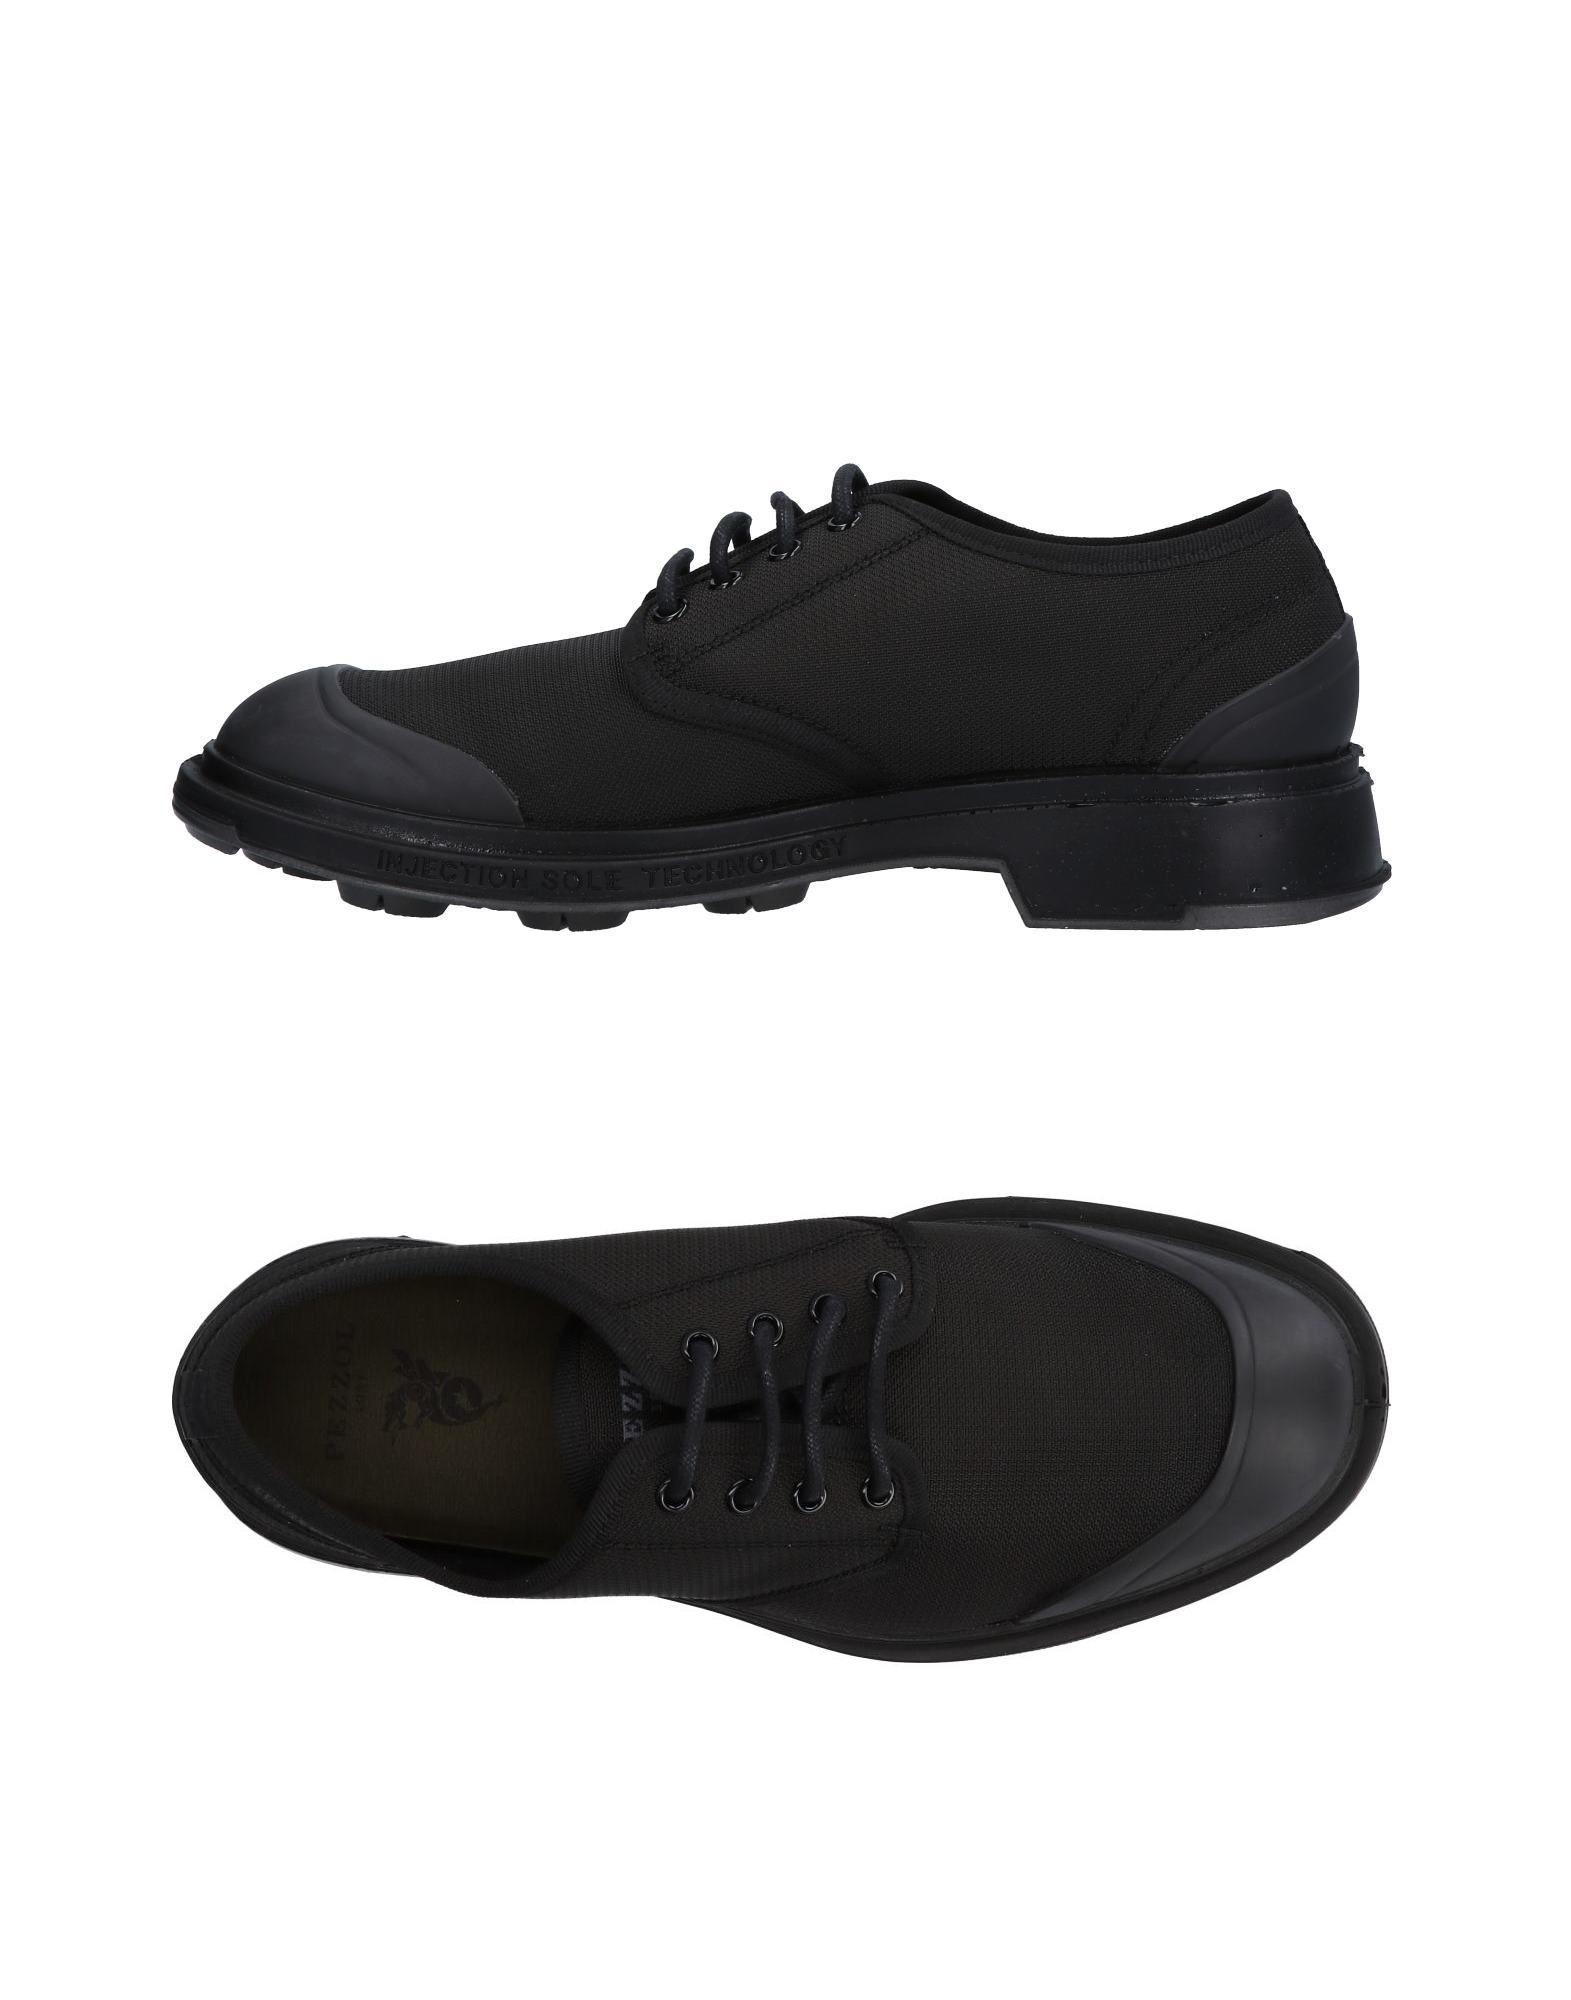 Sneakers Pezzol  1951 Homme - Sneakers Pezzol  1951  Noir Super rabais